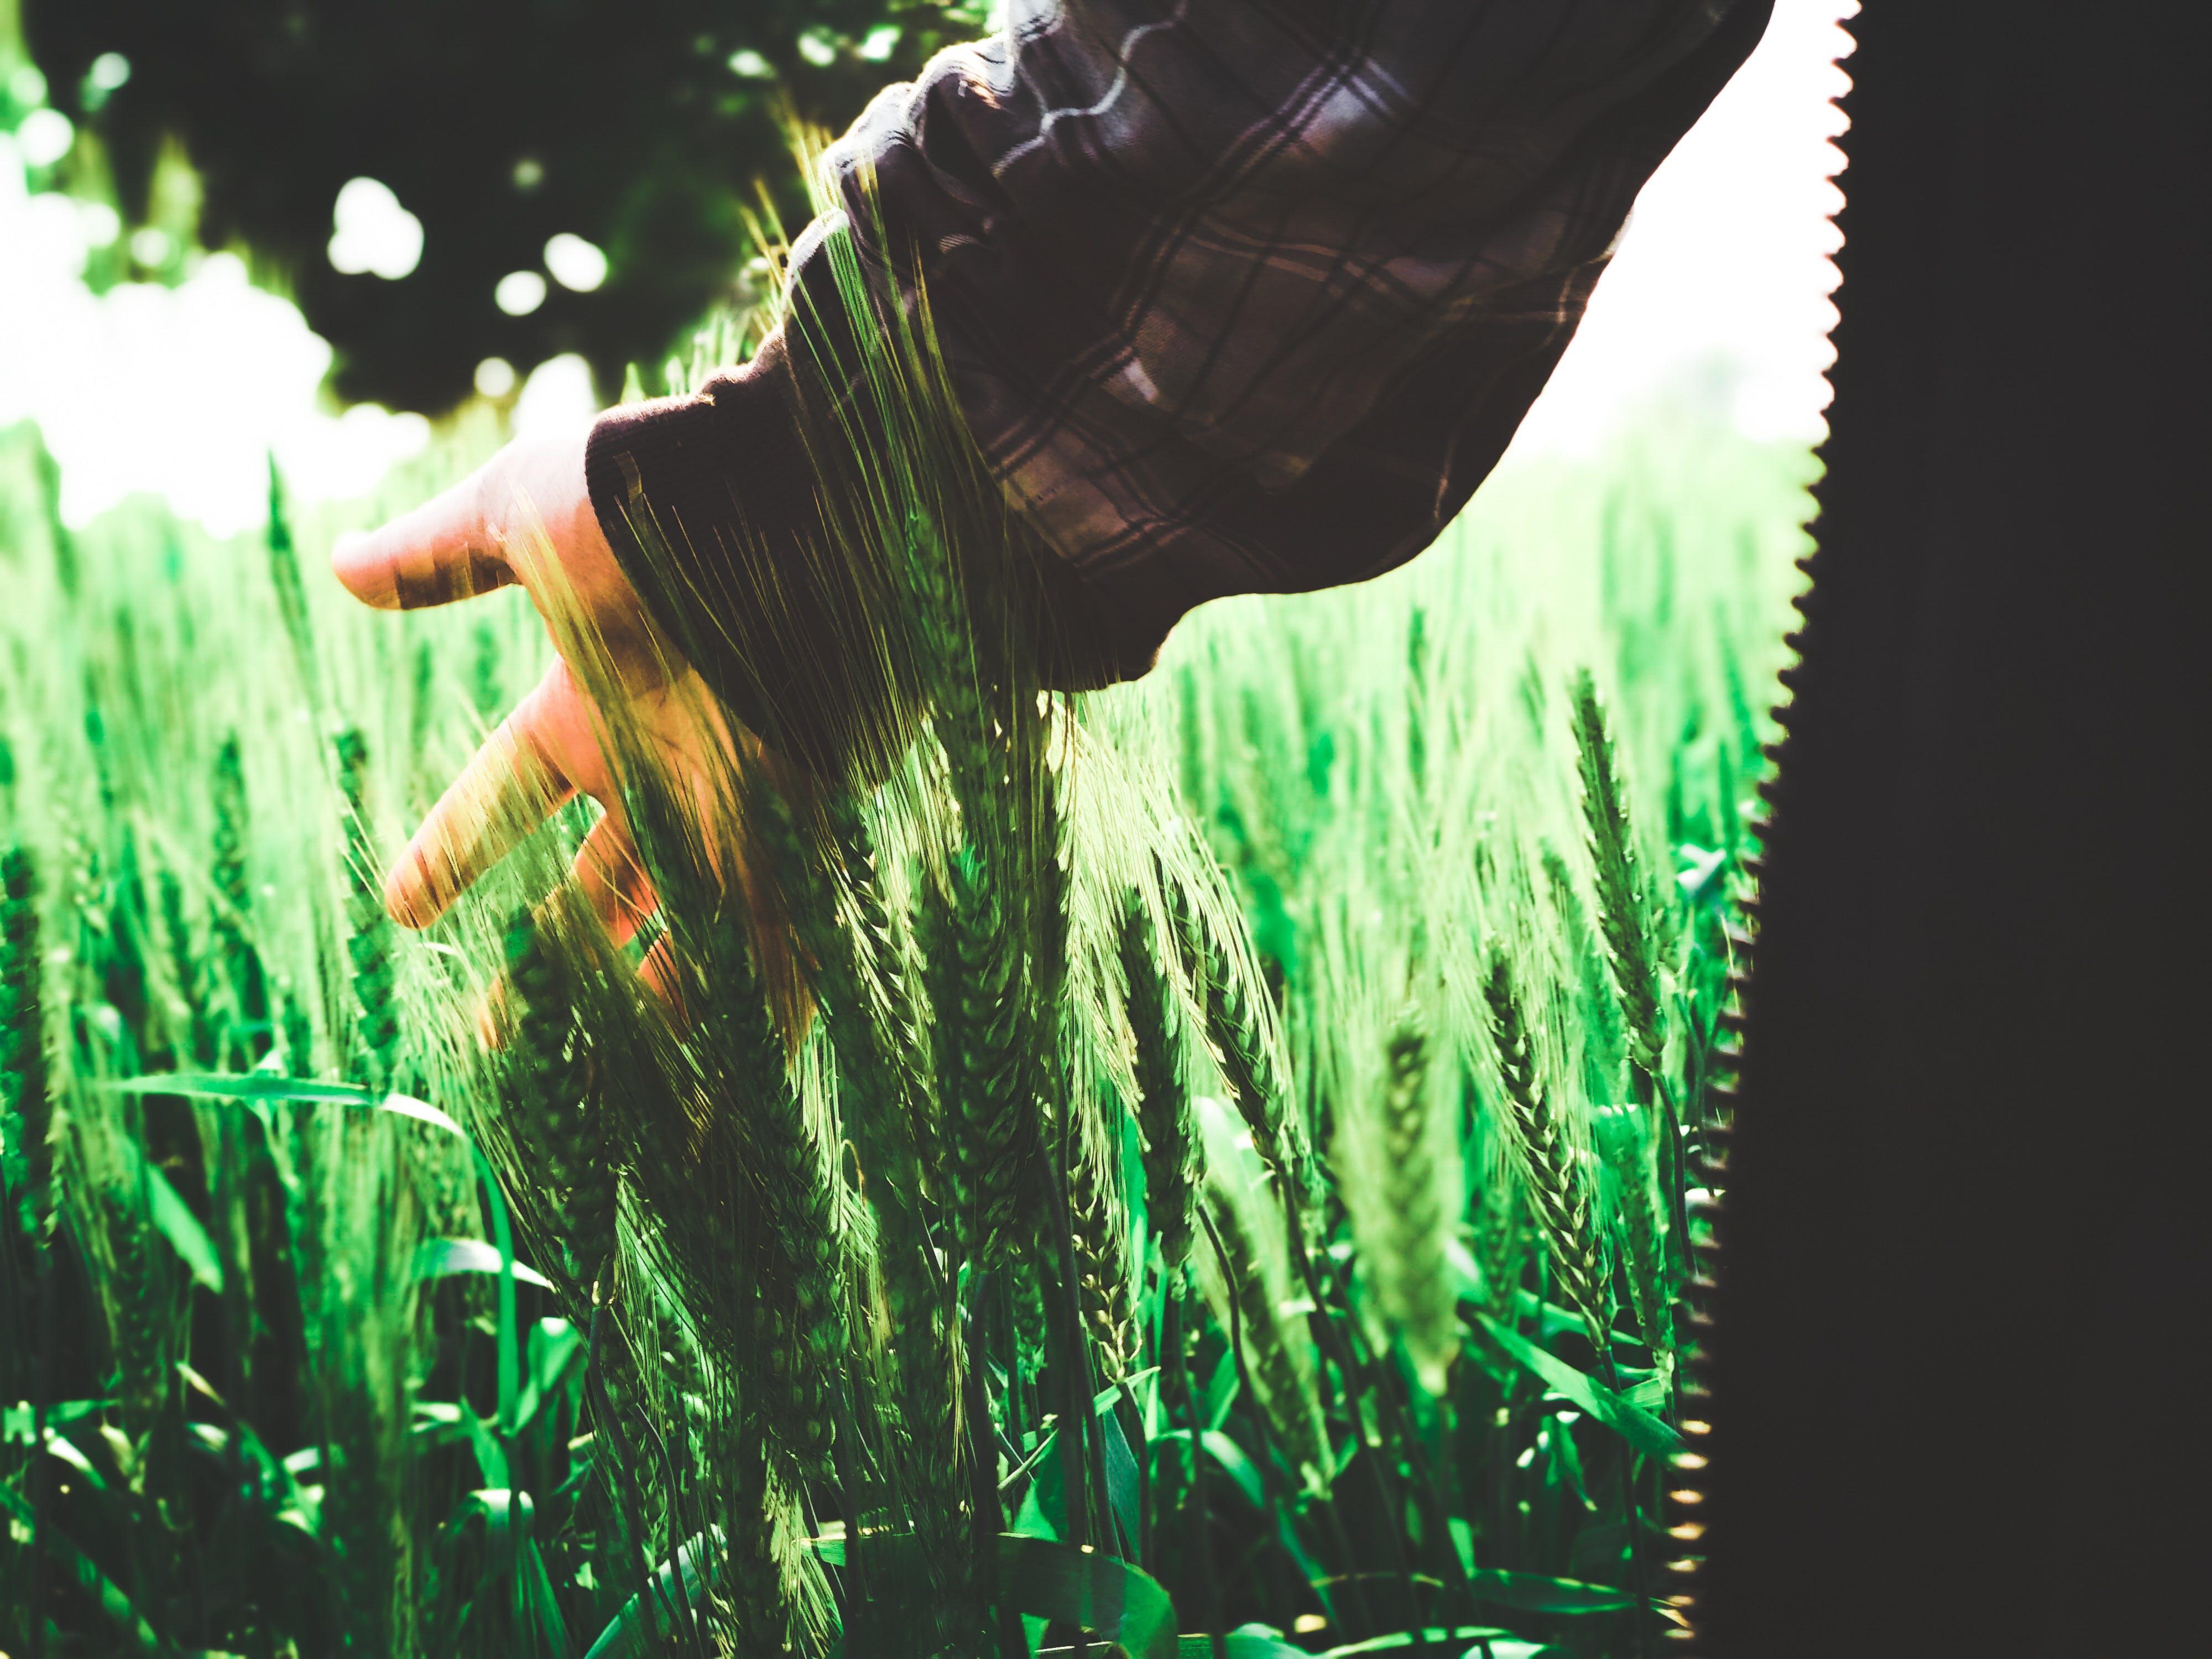 Kostenloses Stock Foto zu feld, feldfüchte, grün, hand